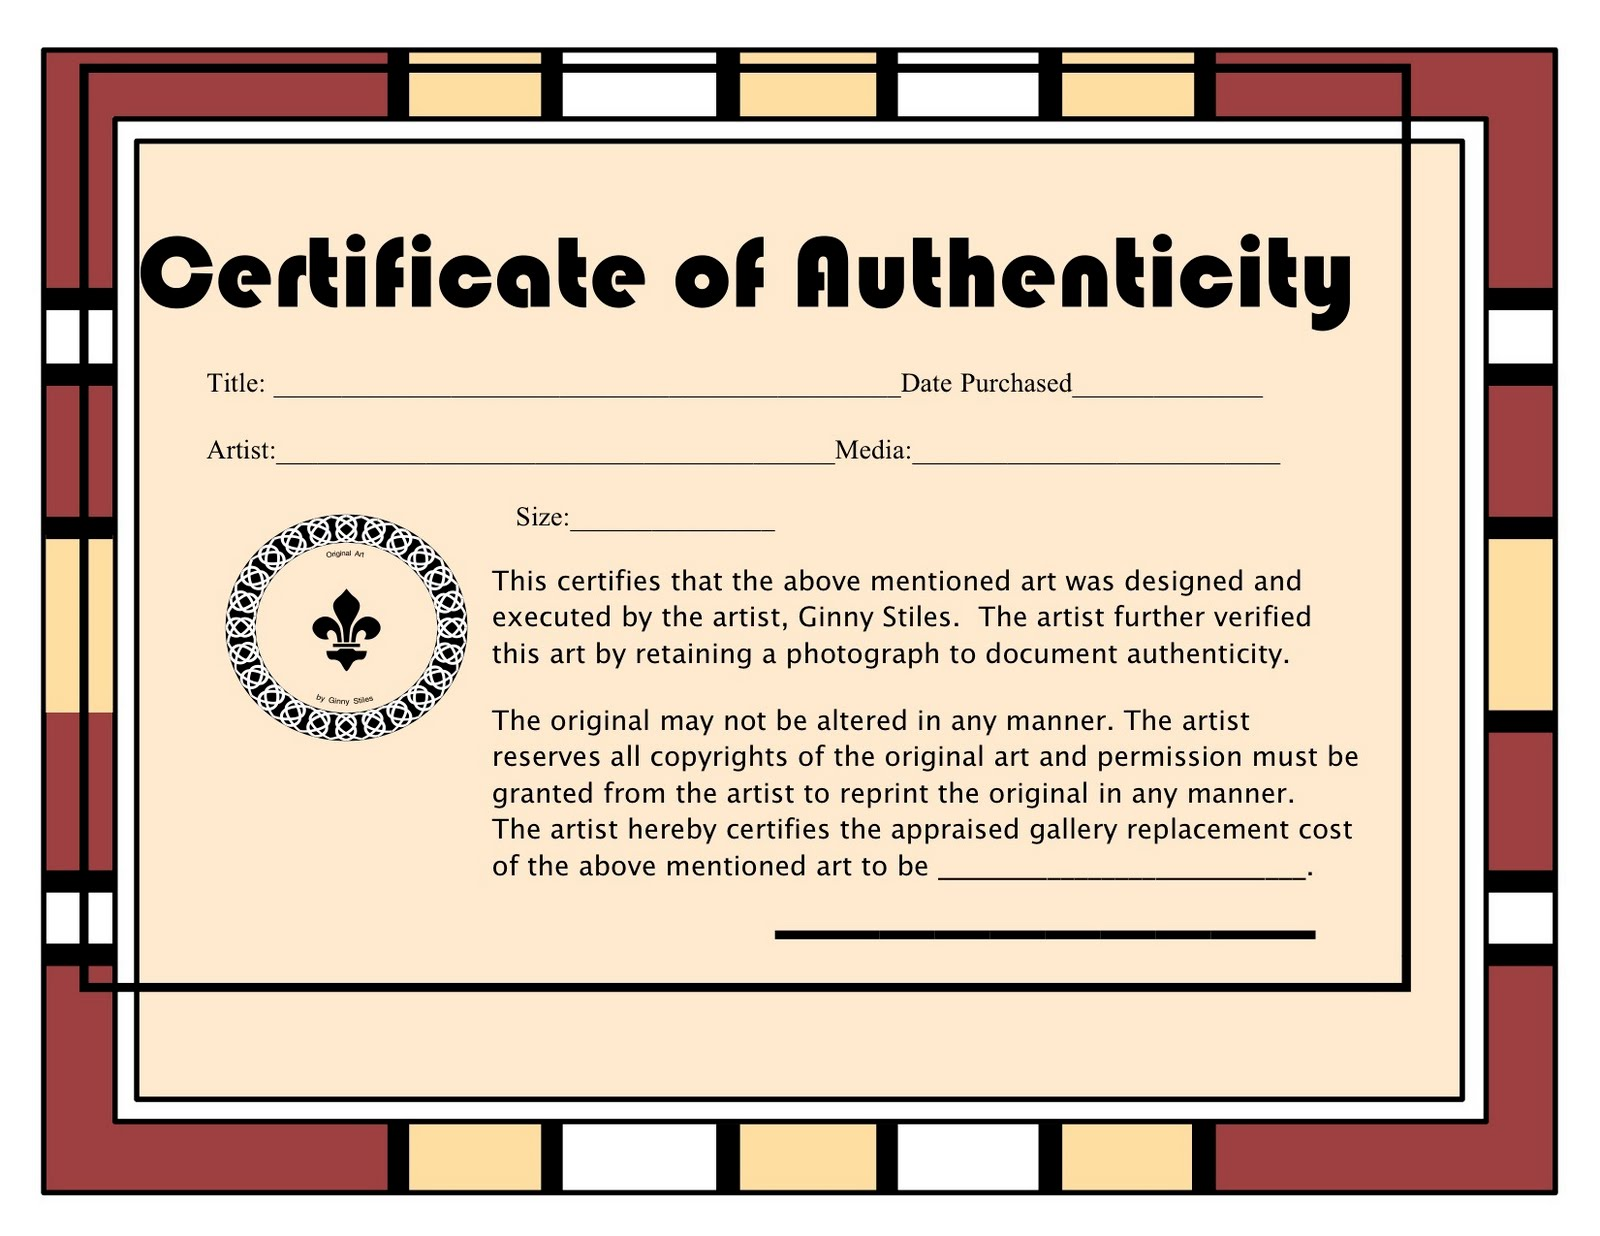 Certificate of authenticity template jeppefm certificate of authenticity template yadclub Gallery